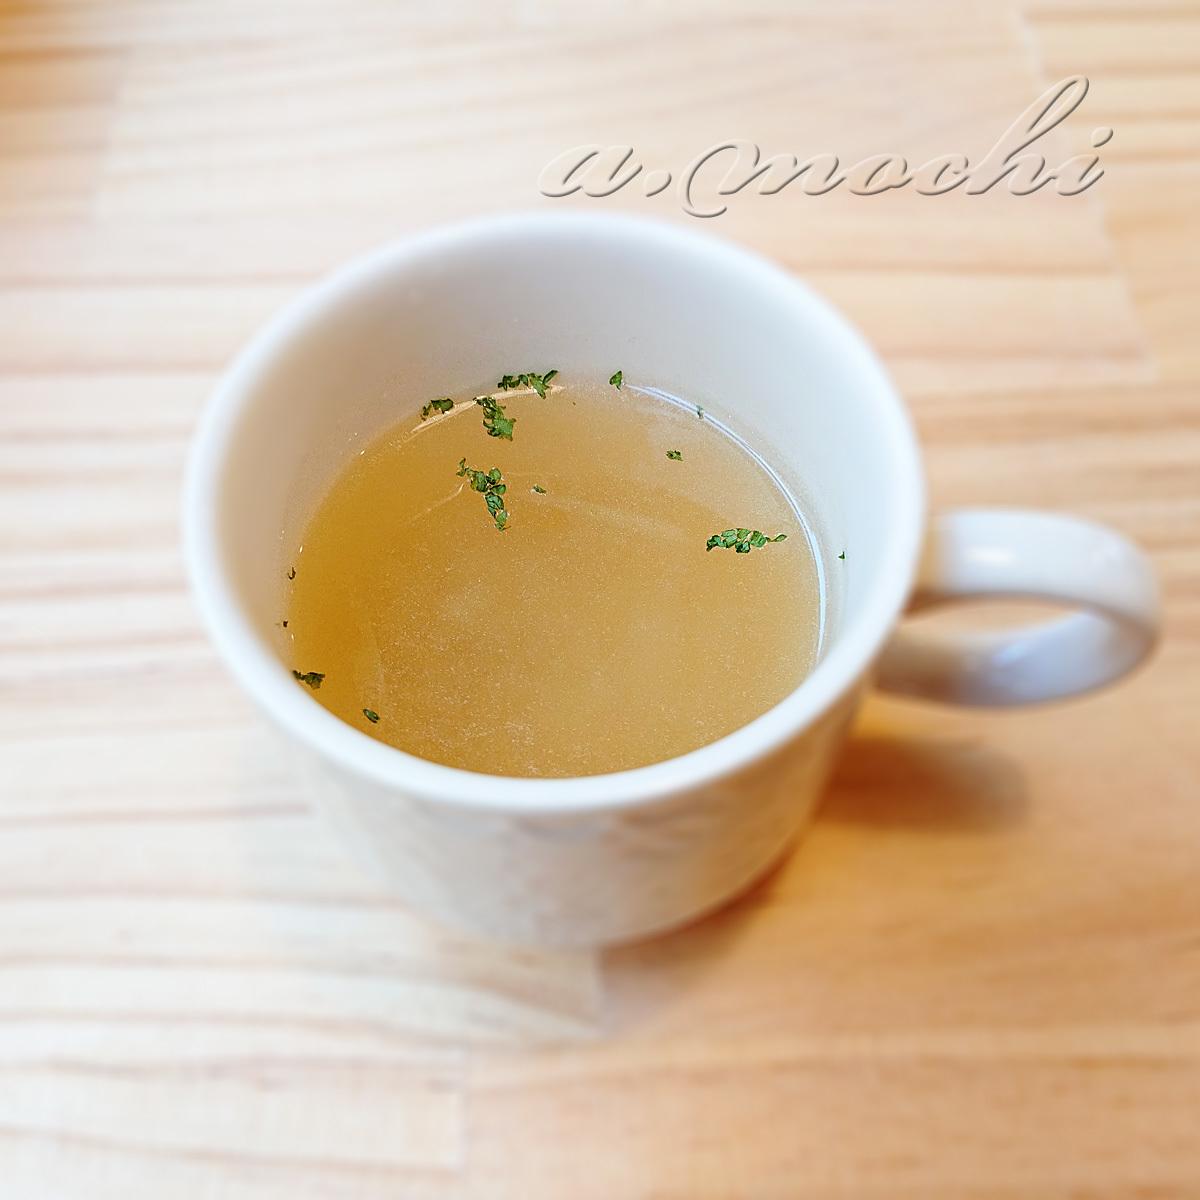 lifelong_soup.jpg